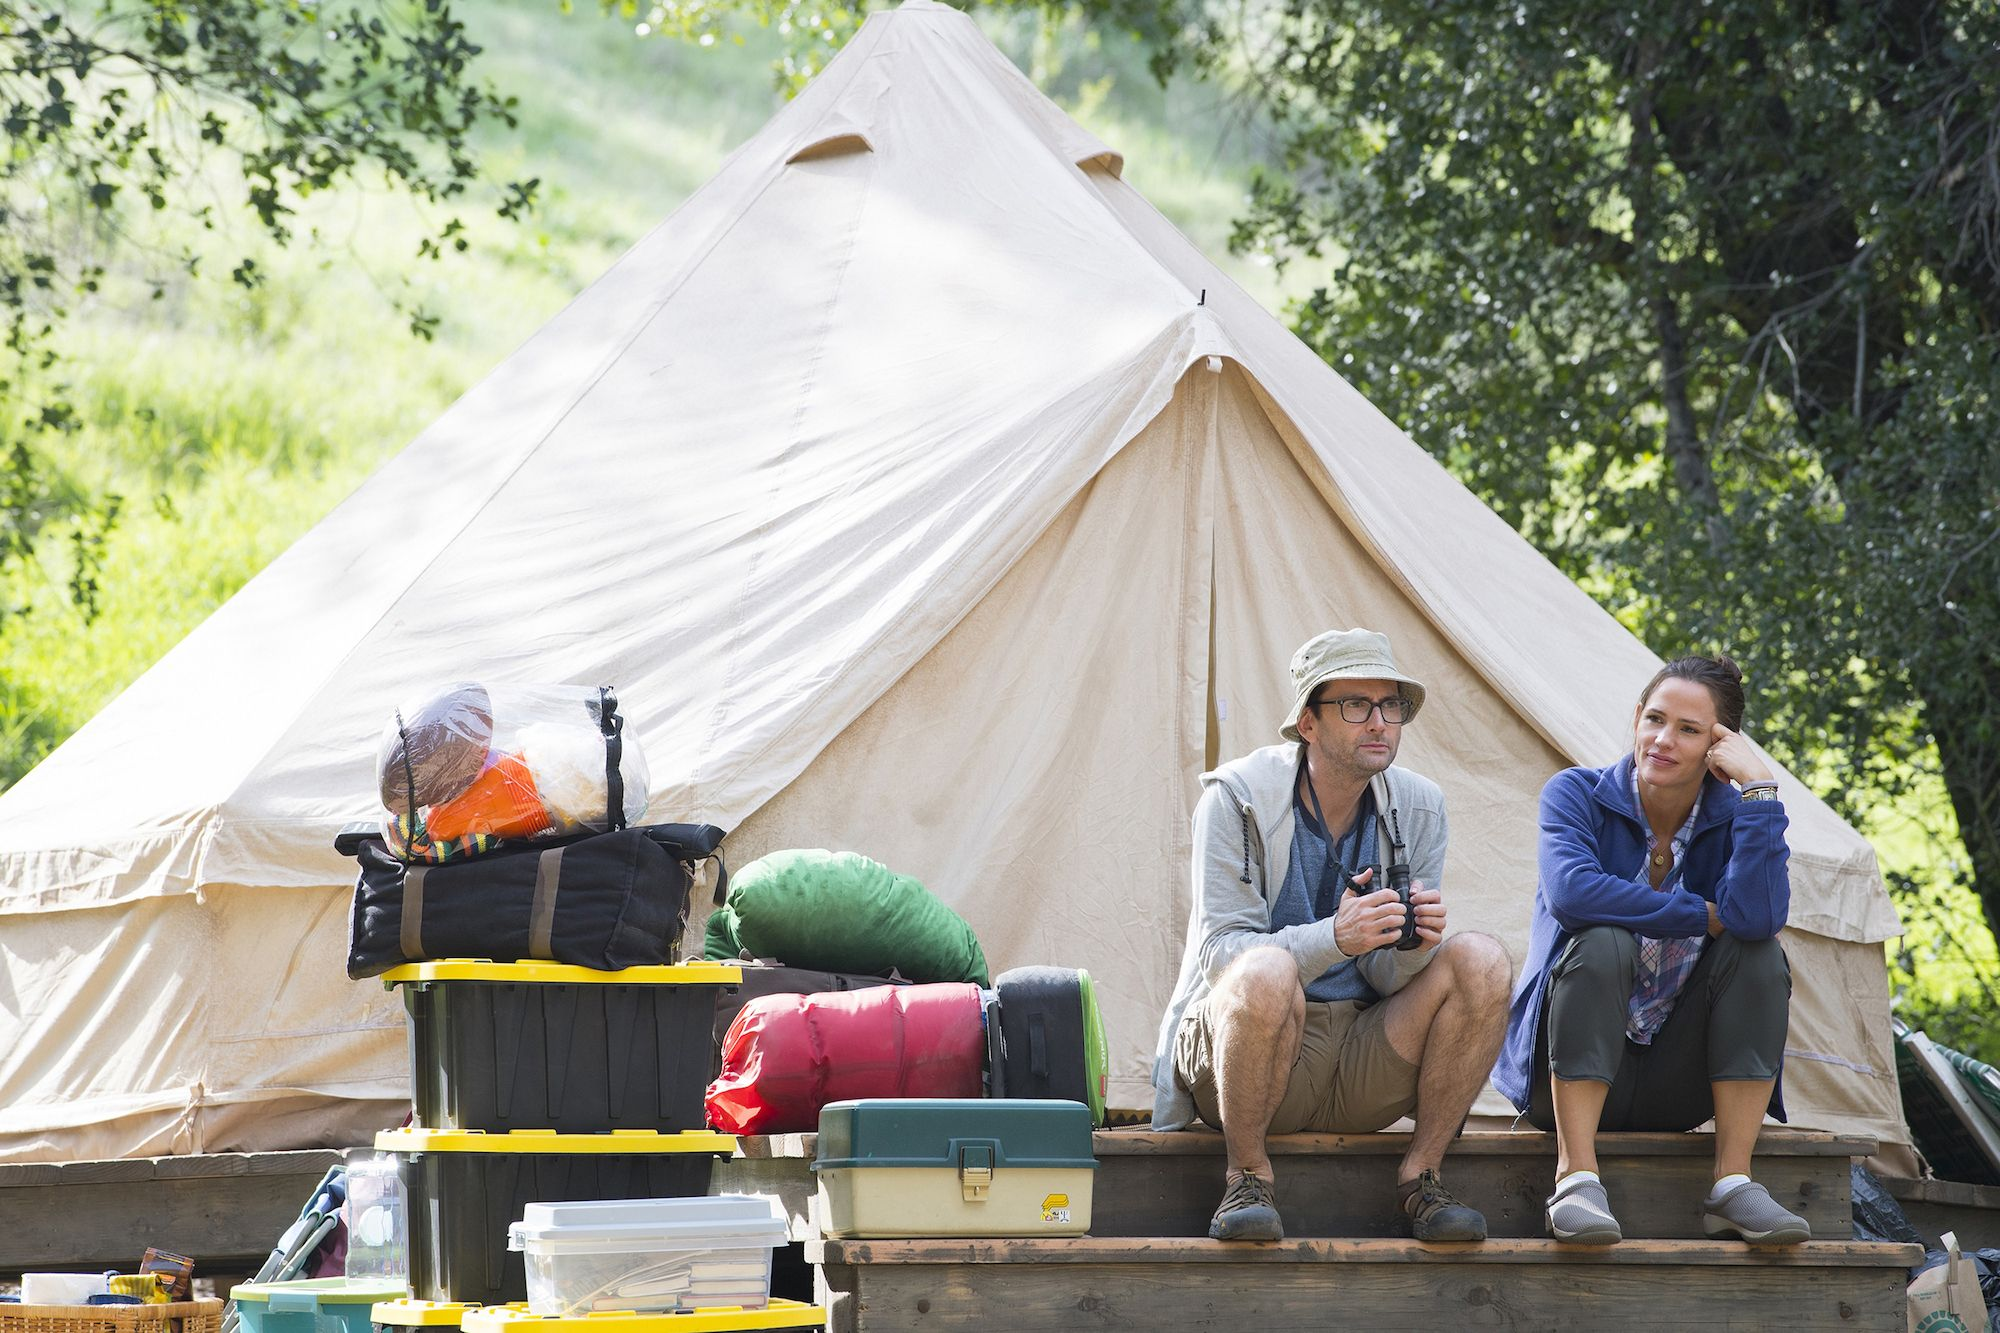 Camping Review: Despite Jennifer Garner, You Can Skip This Trip ...